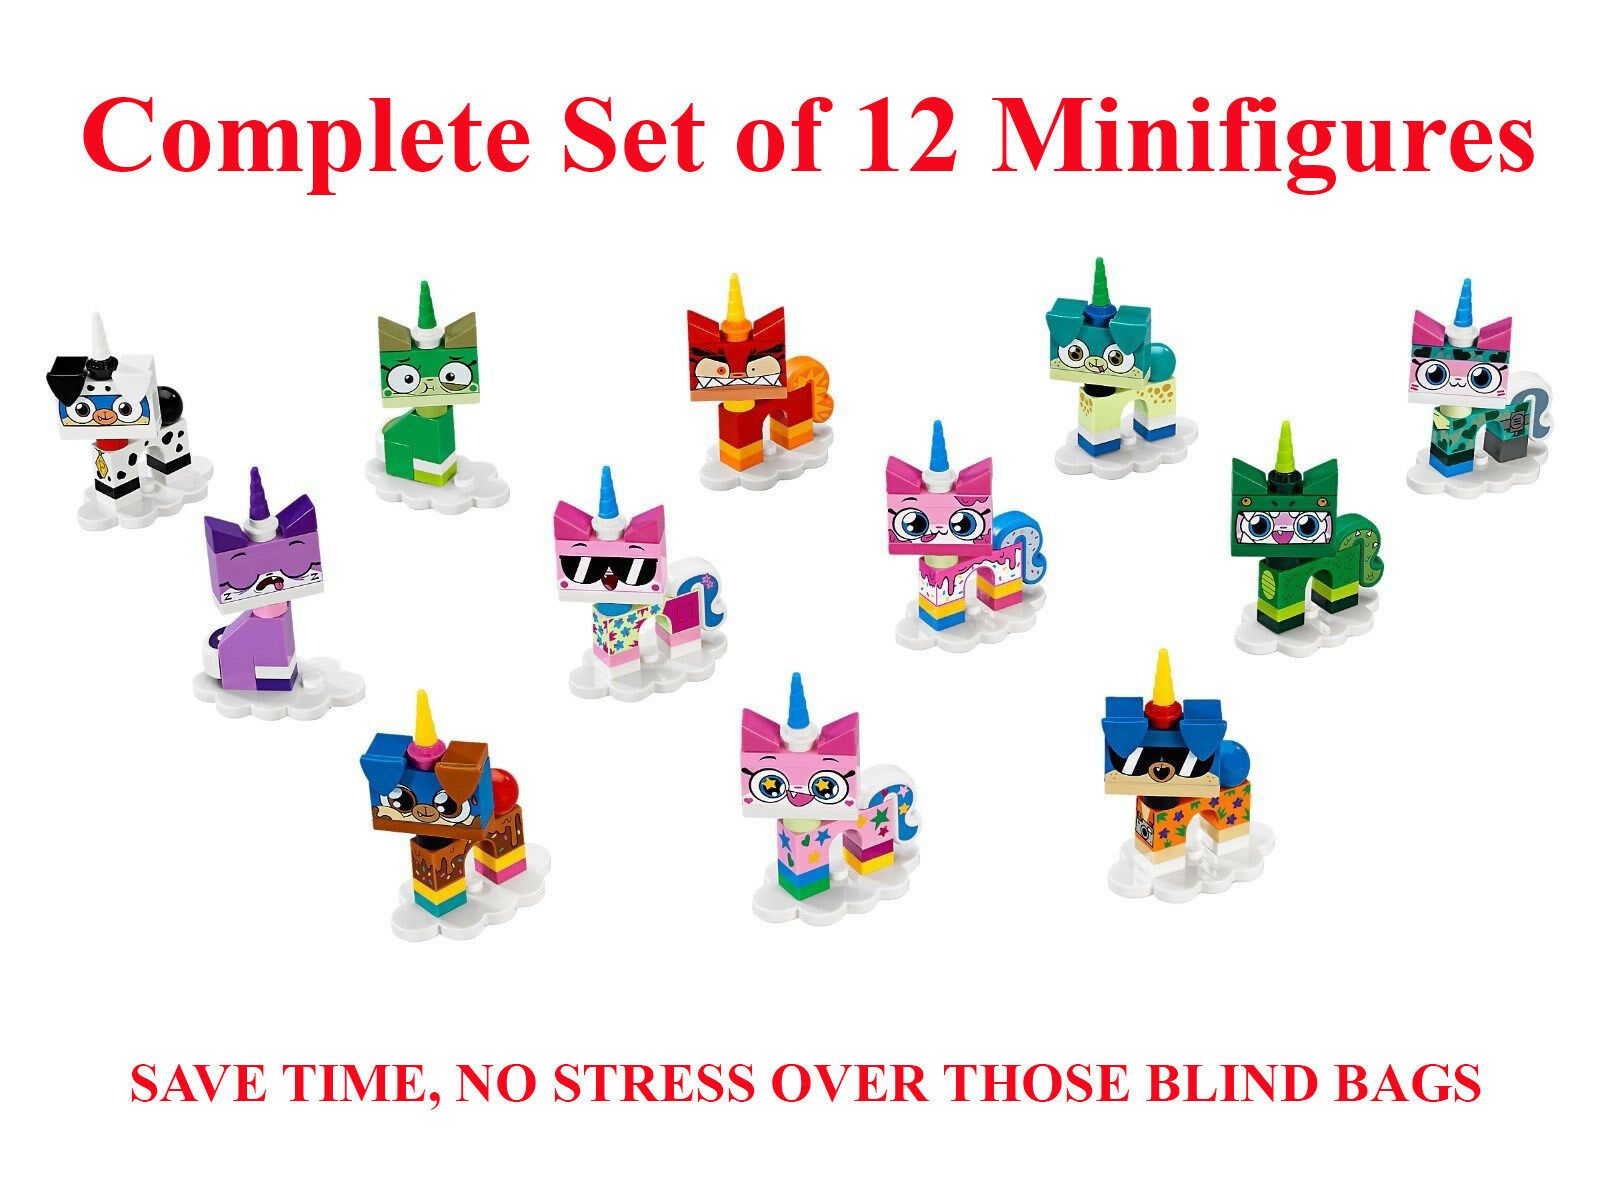 Lego Unikitty Series 1 Complete Set of 12 Minifigures - Cartoon Network 41775